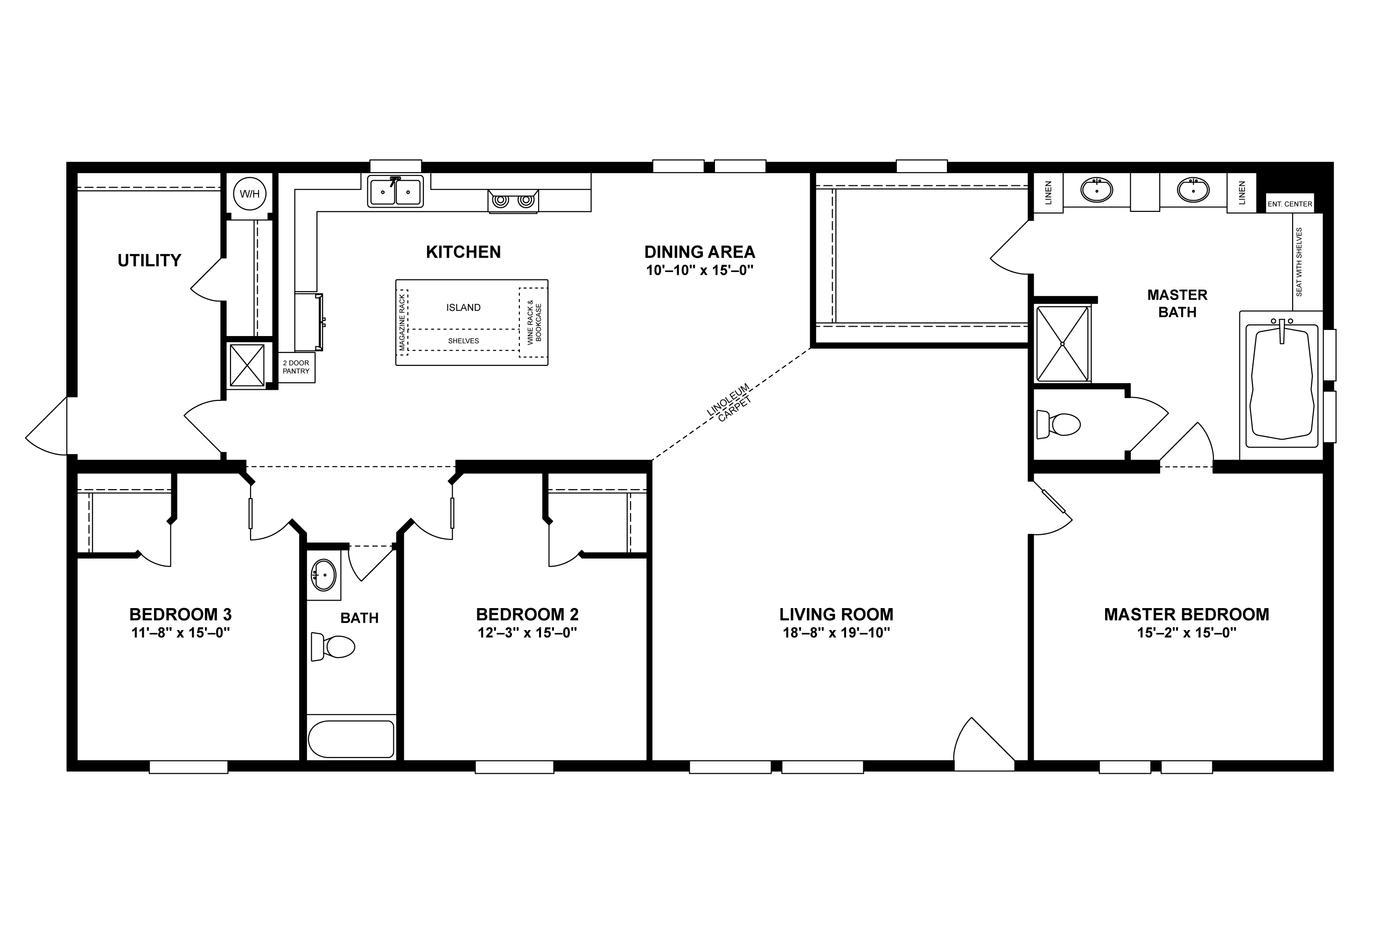 The Graff Floorplan